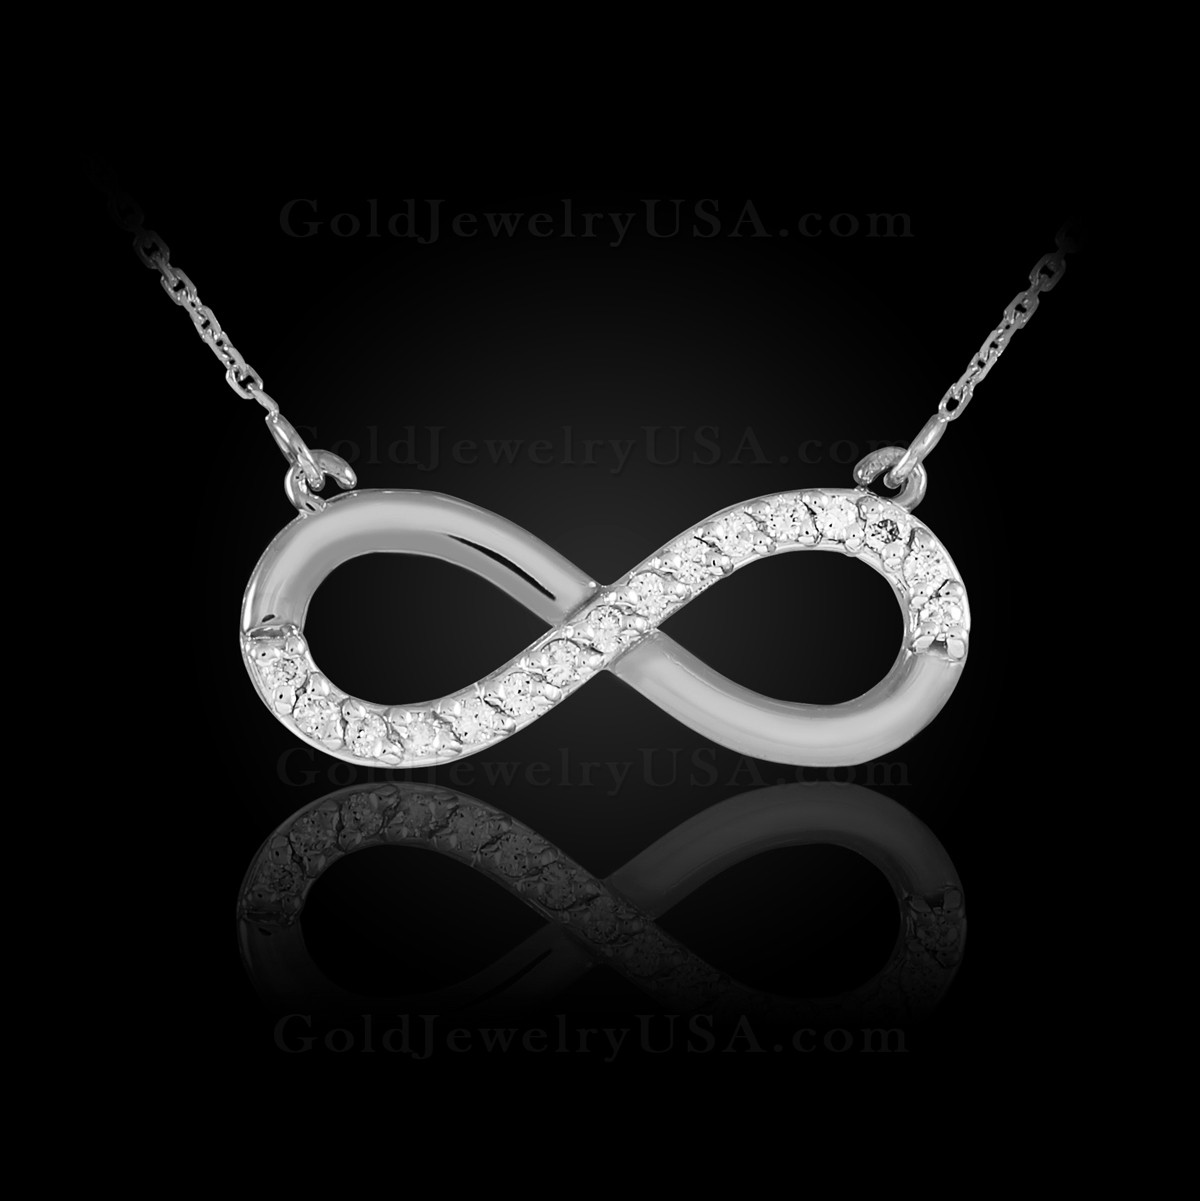 zm ct rose heart to jared jaredstore infinity necklace zoom gold en jar tw mv diamonds hover